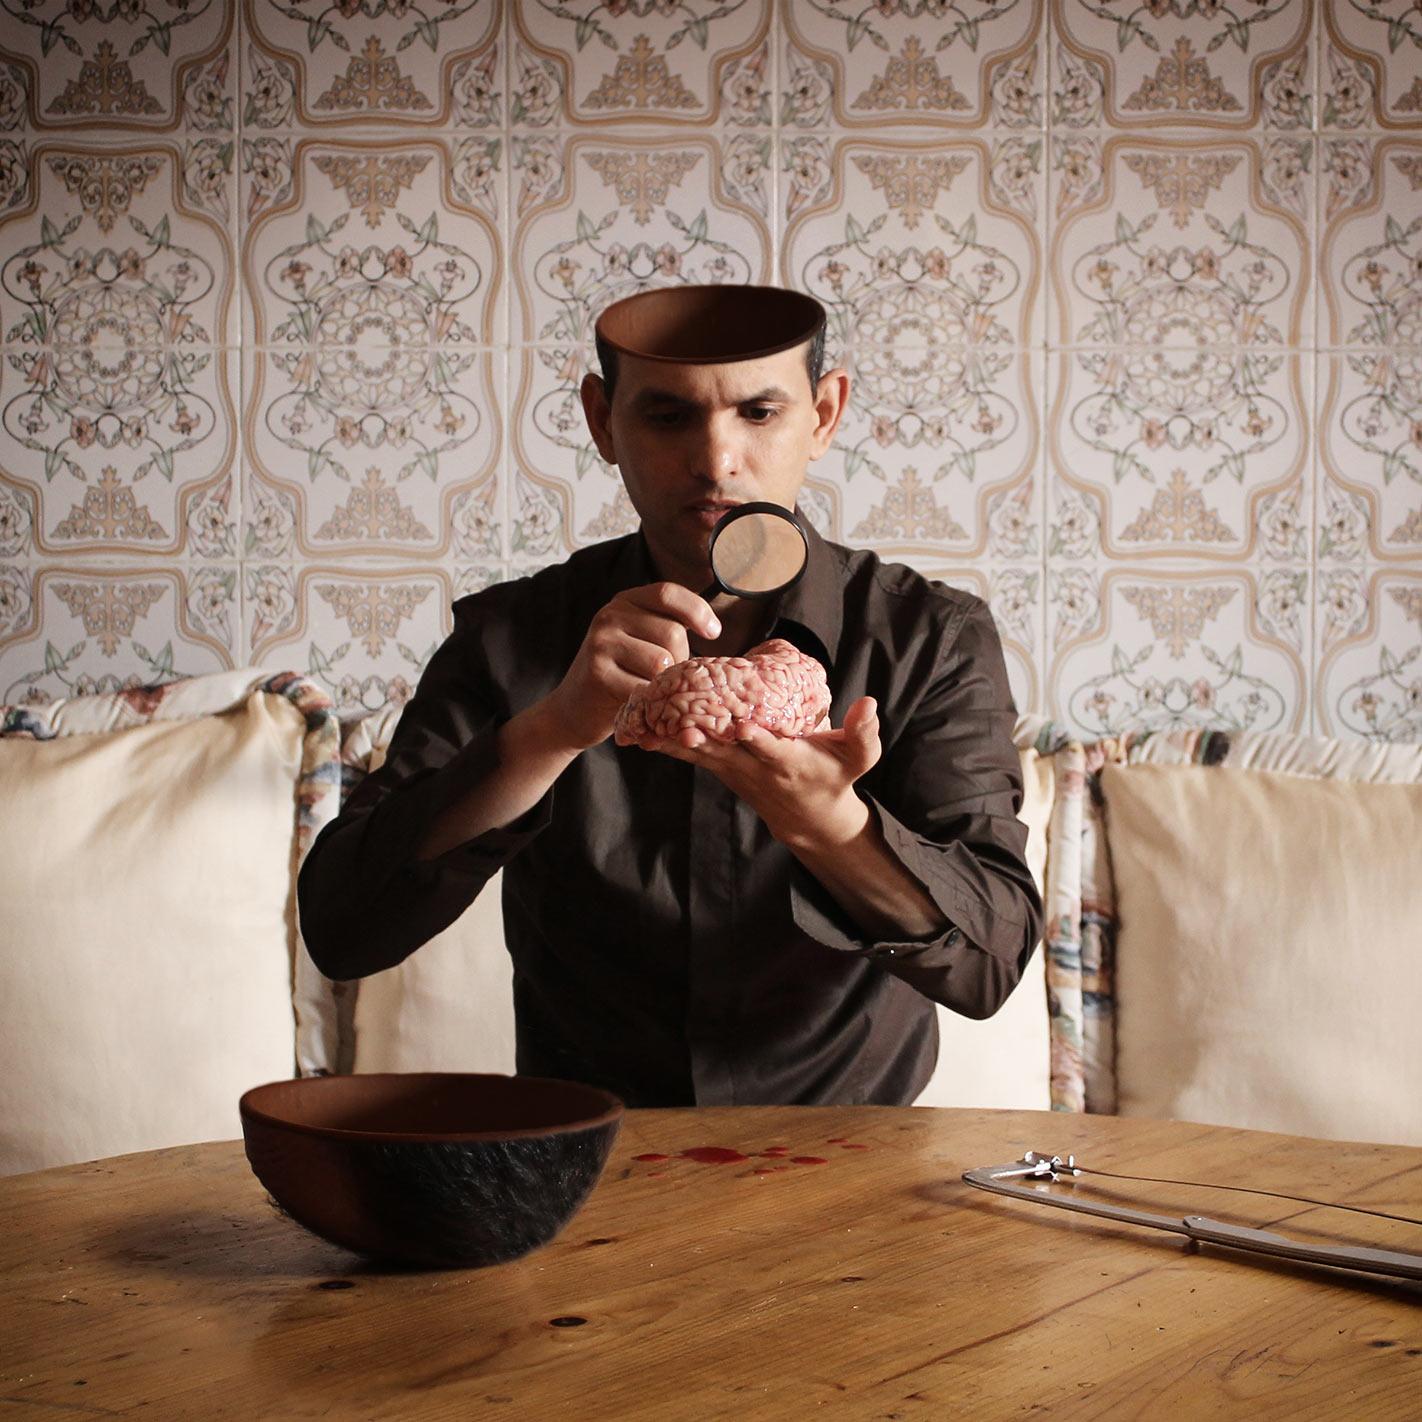 Surrealist Self Portraits By Achraf Baznani The PhotoPhore